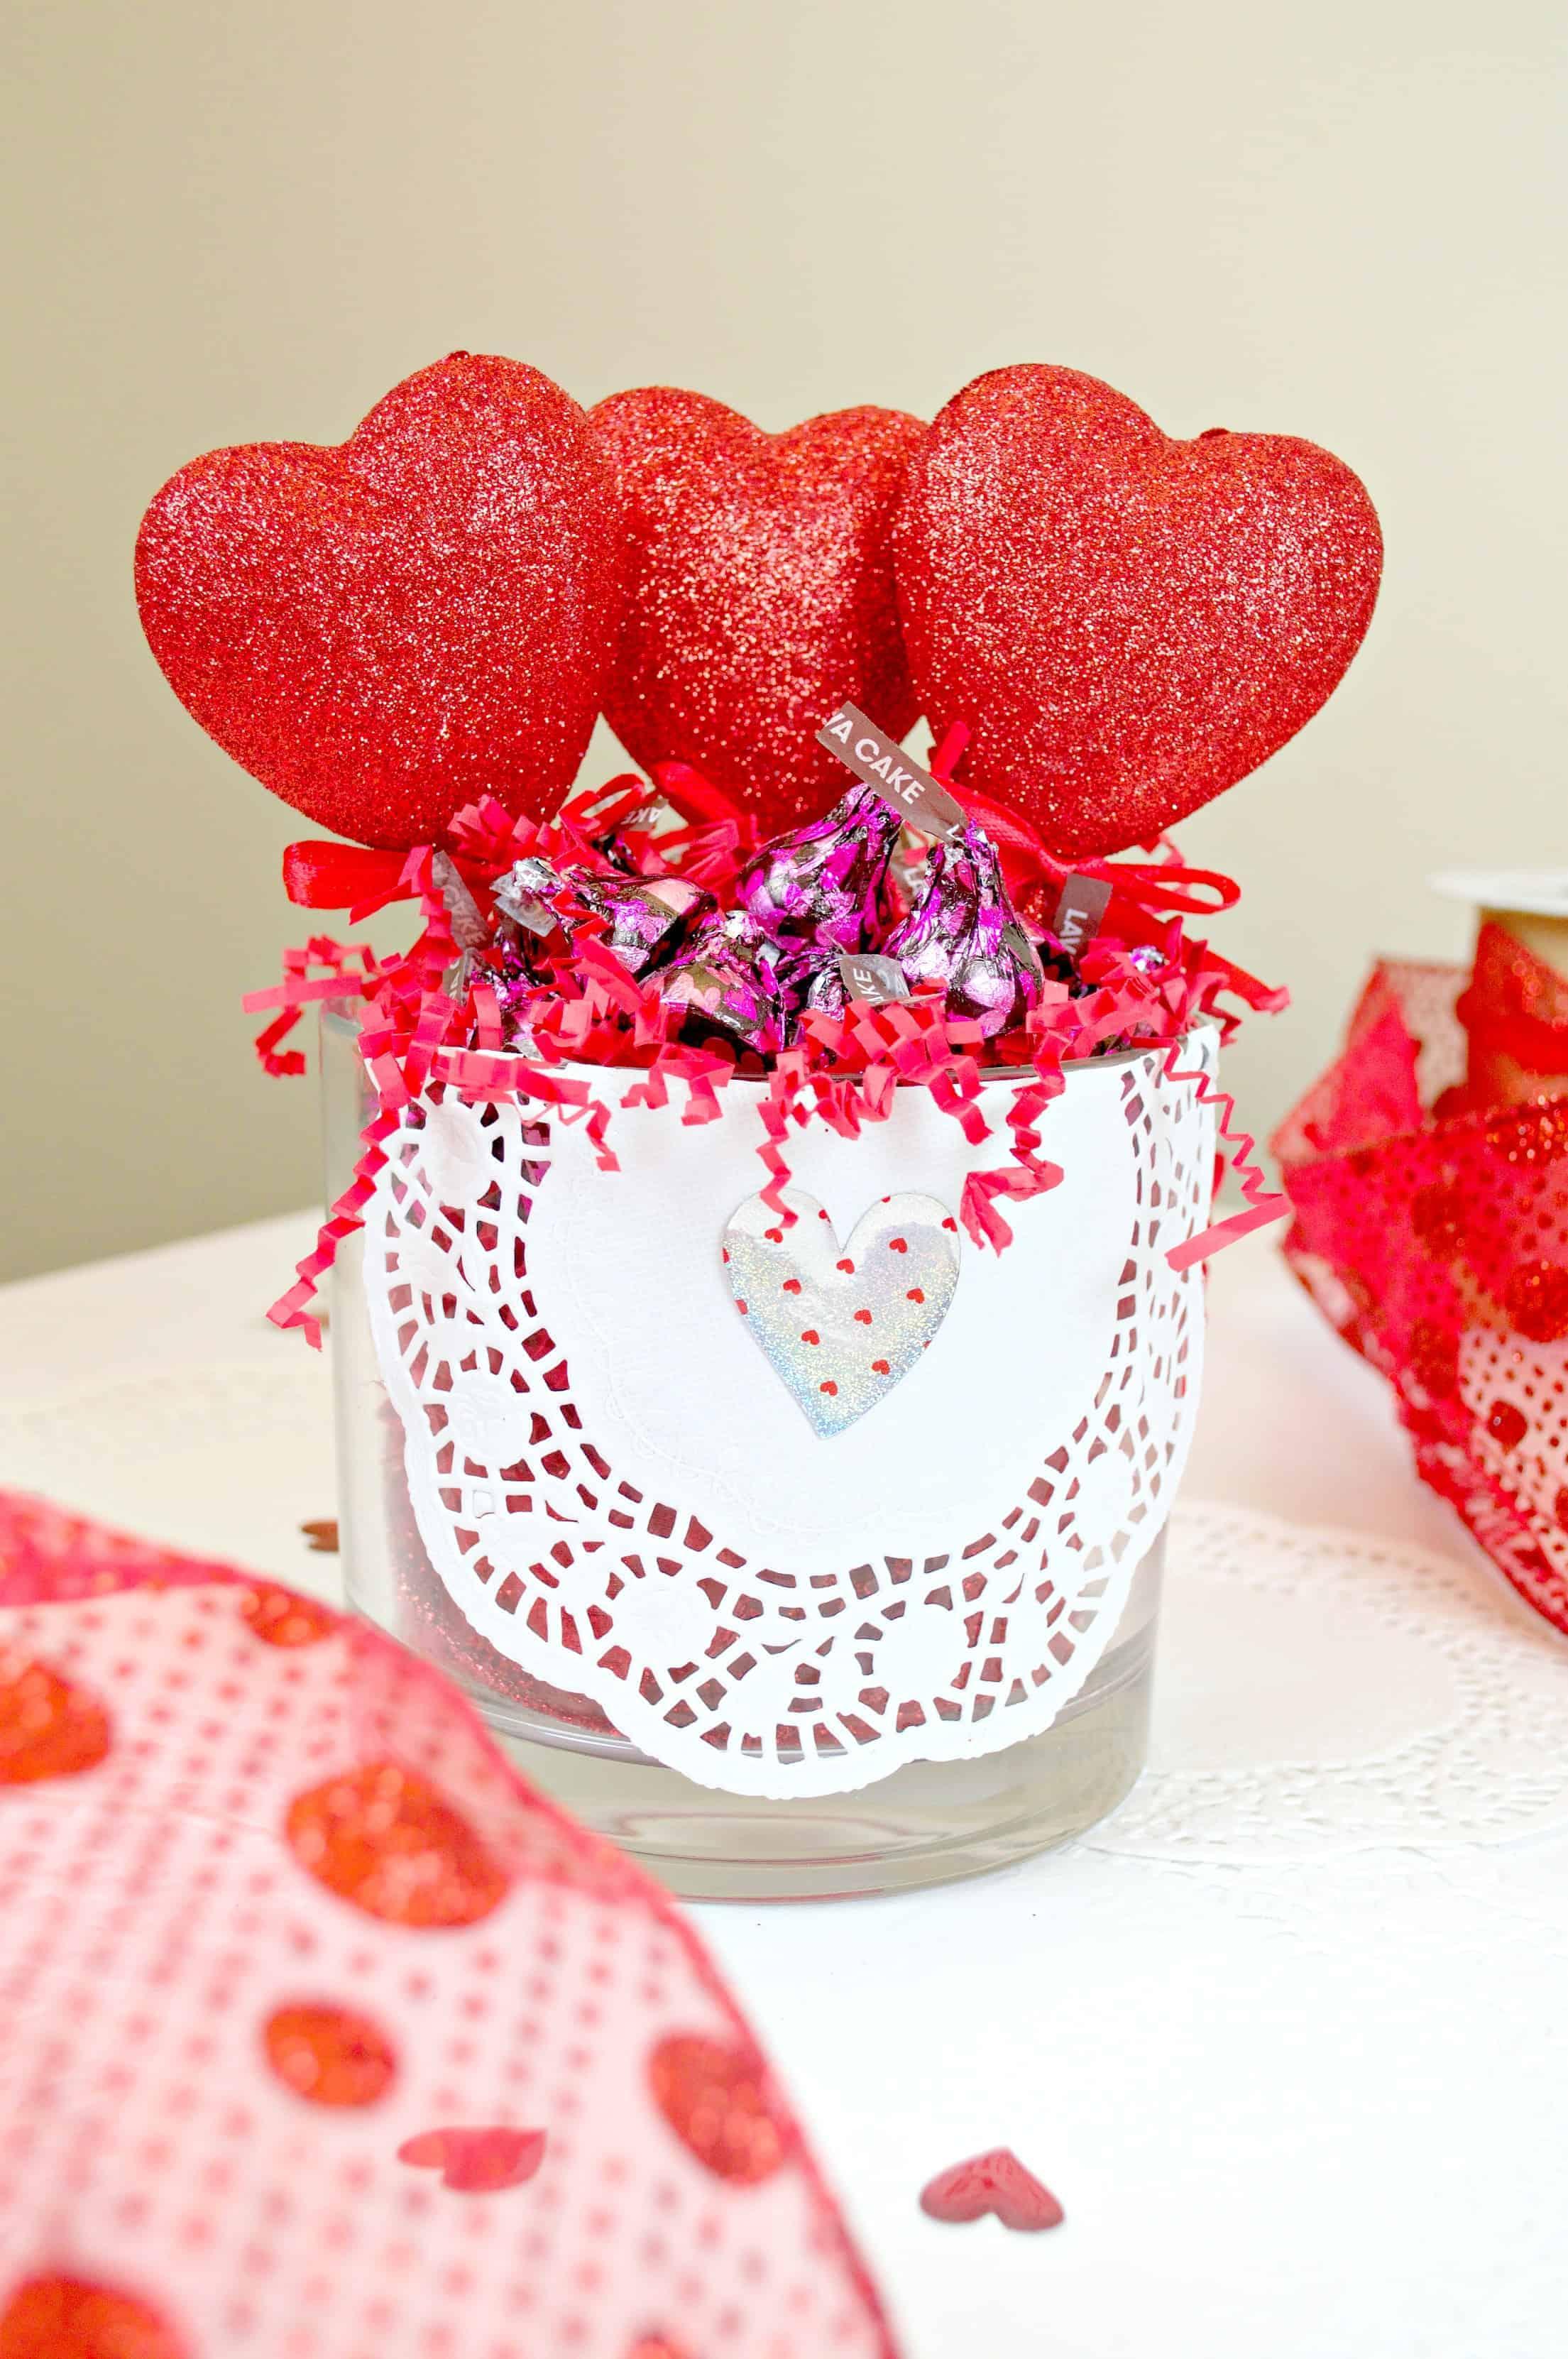 DIY Valentine's Day Candy Dish